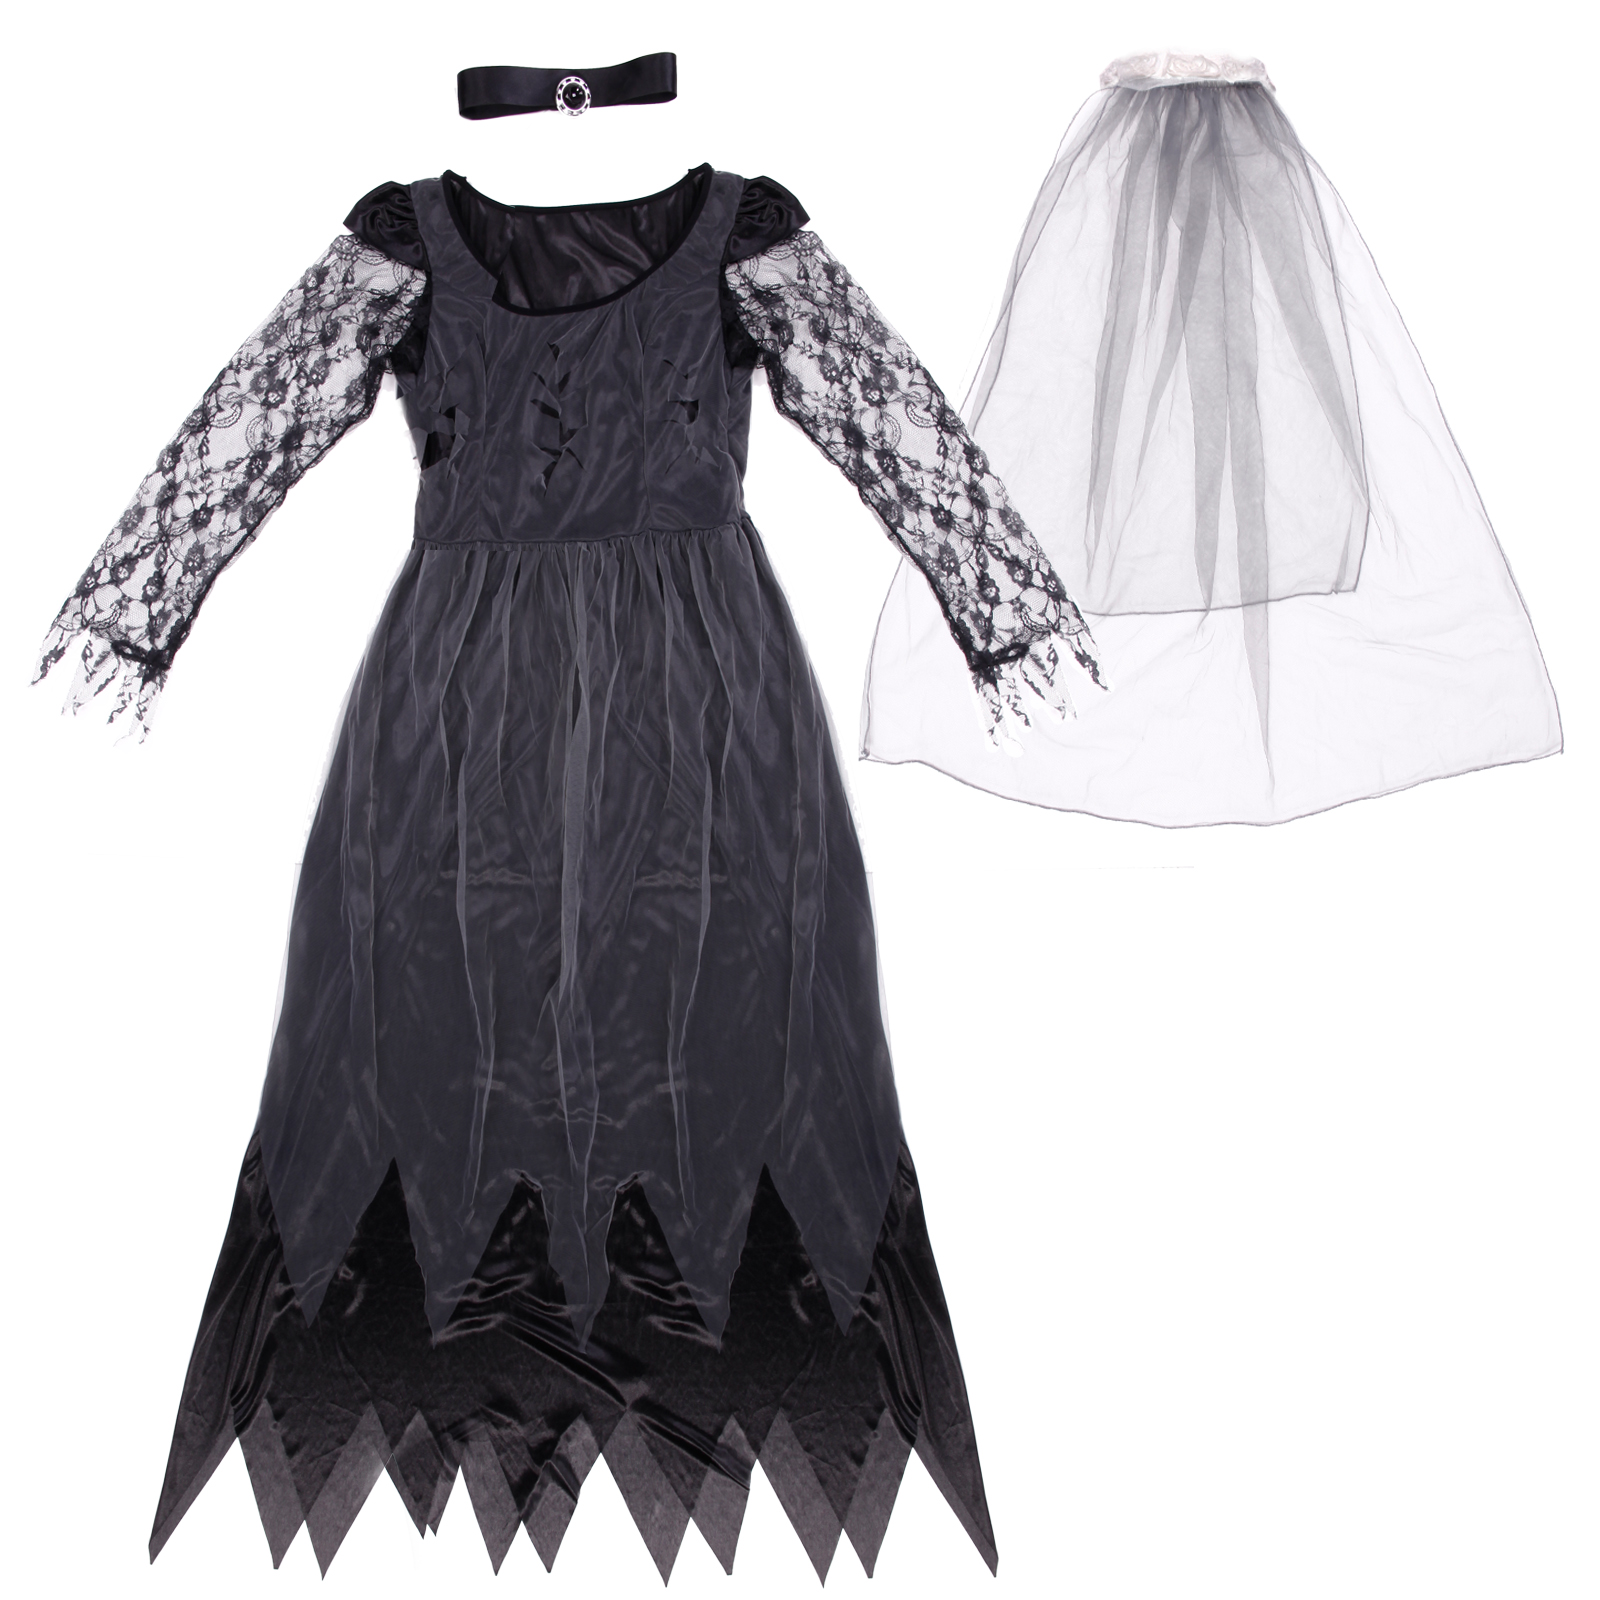 geist braut kost m horror geisterbraut halloween karneval verkleidung damen. Black Bedroom Furniture Sets. Home Design Ideas